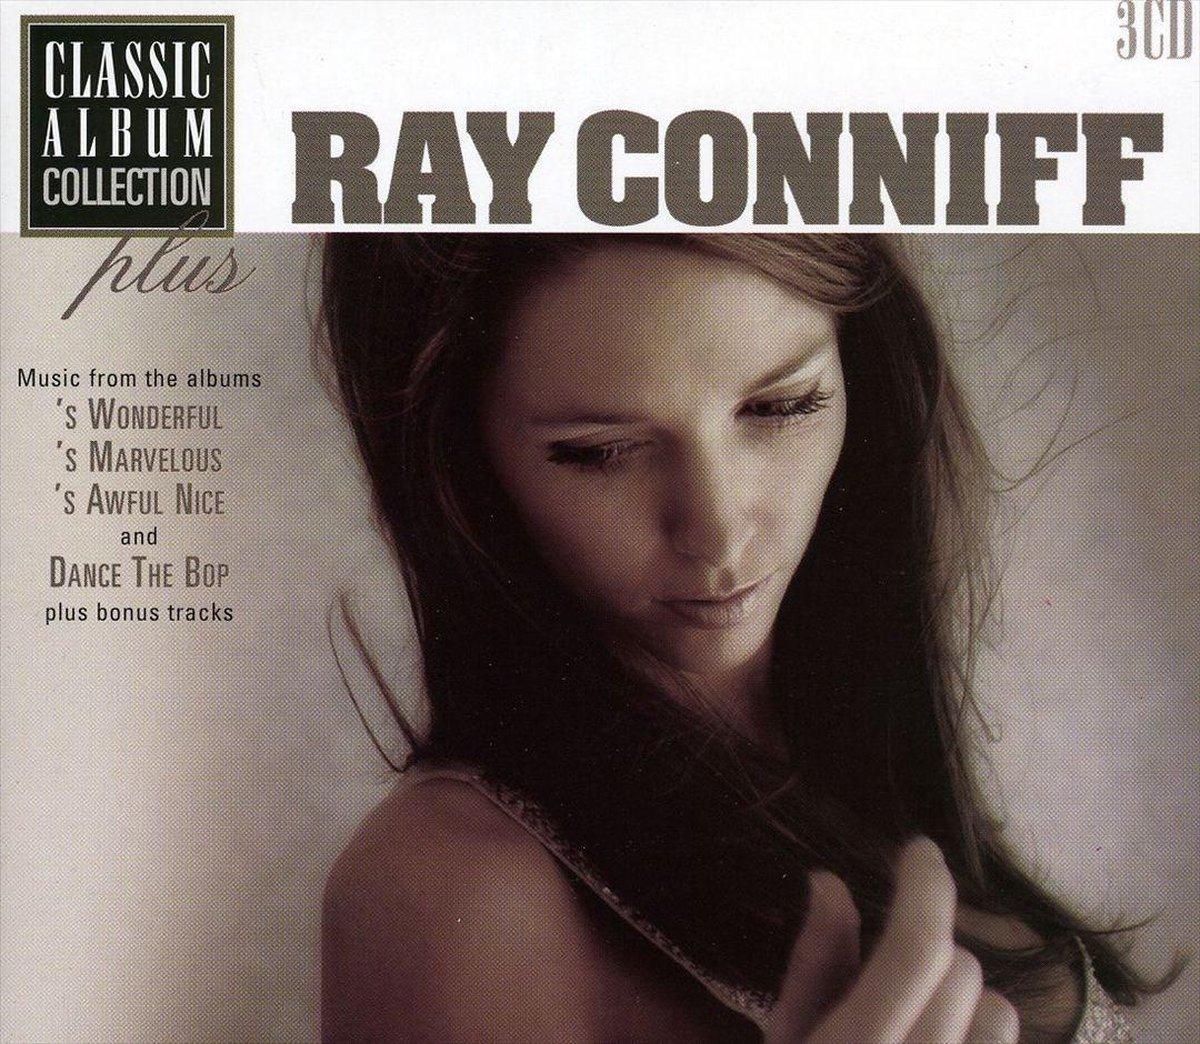 Classic Album Collection Plus - Ray Conniff